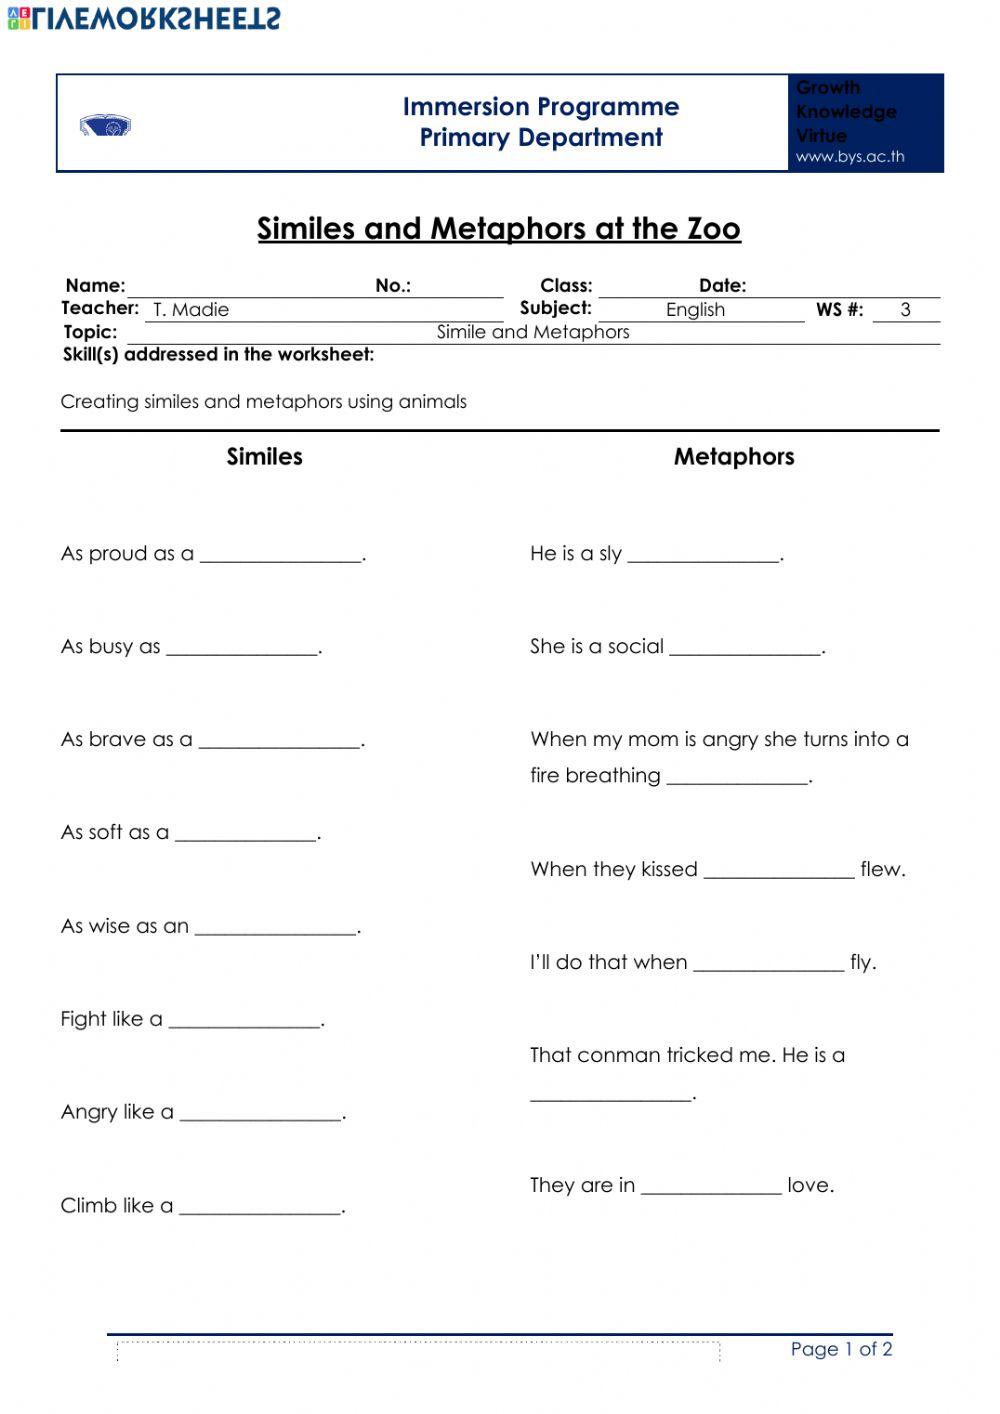 Animals In Similes And Metaphors Worksheet